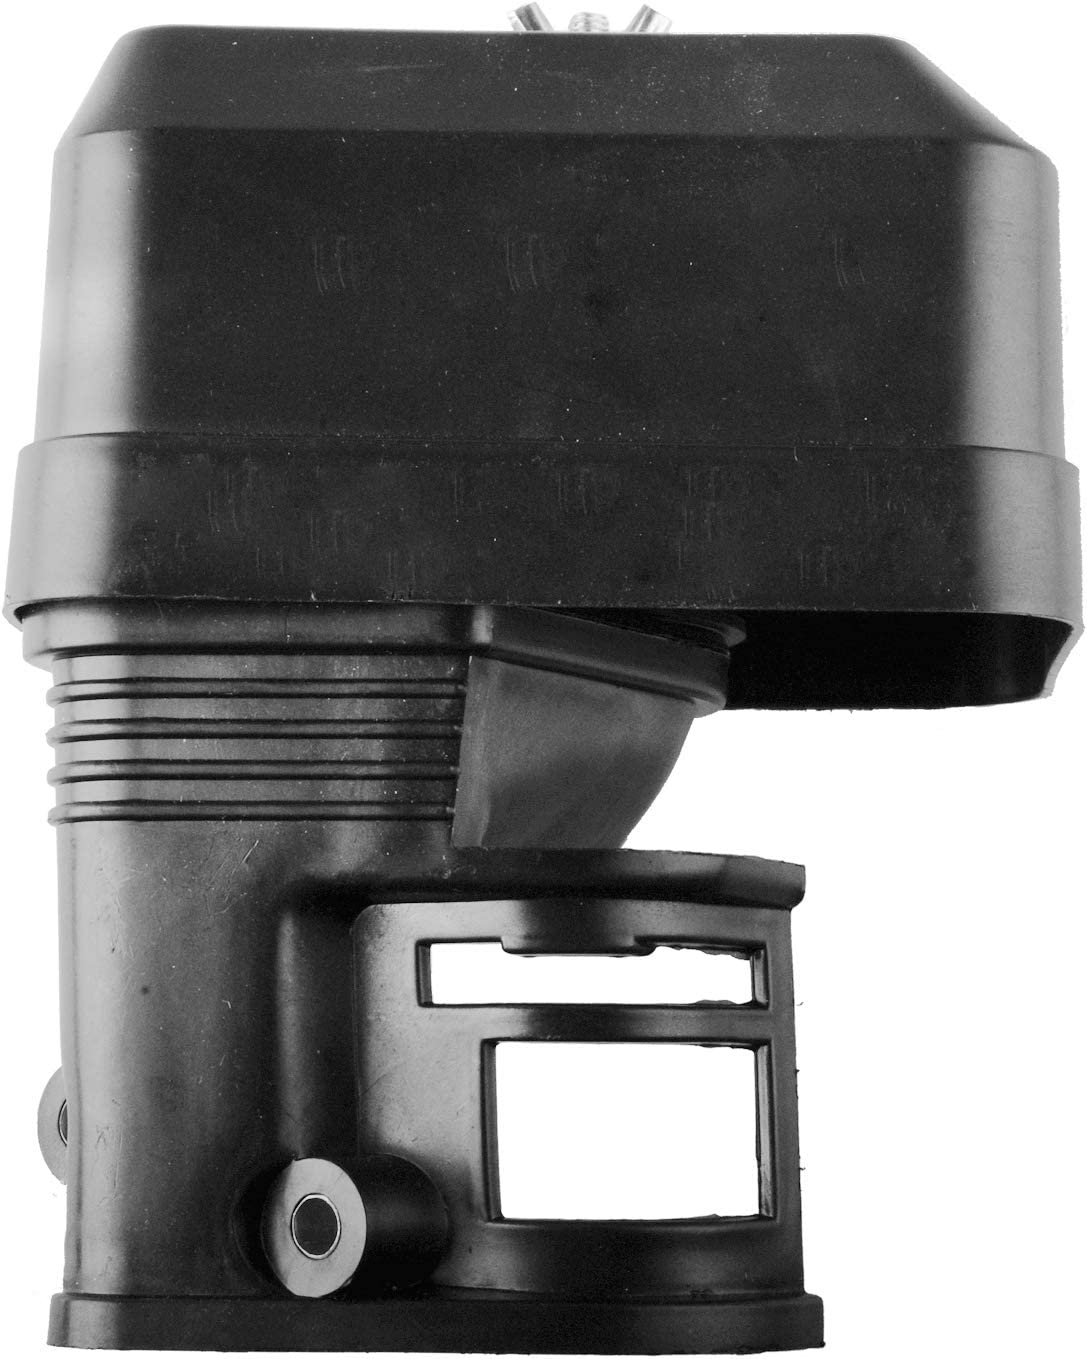 Poweka Air Filter Cleaner Housing Cover Box Assembly for Honda Gx200 Gx160 Gx140 GX120 168F 196cc 163cc 5.5hp 6.5hp Generator Water Pump